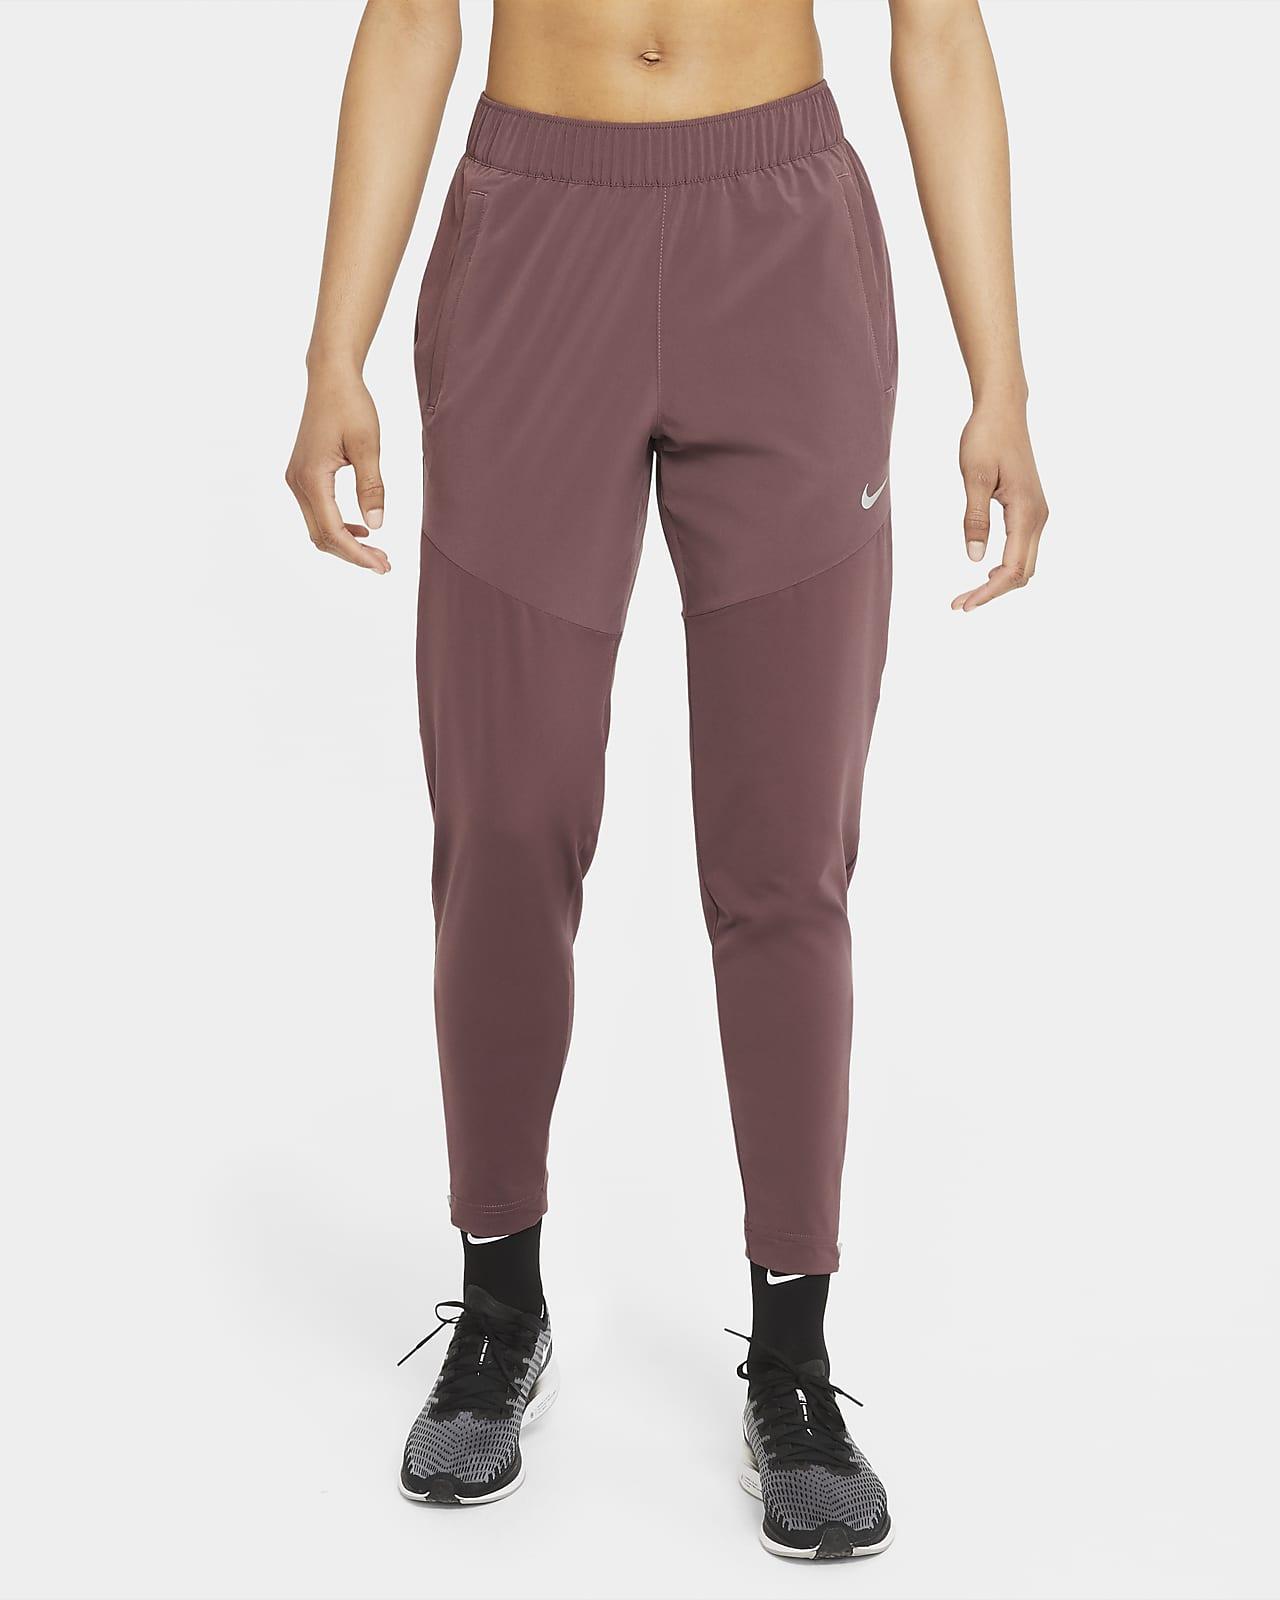 Nike Dri-FIT Essential Women's Running Trousers